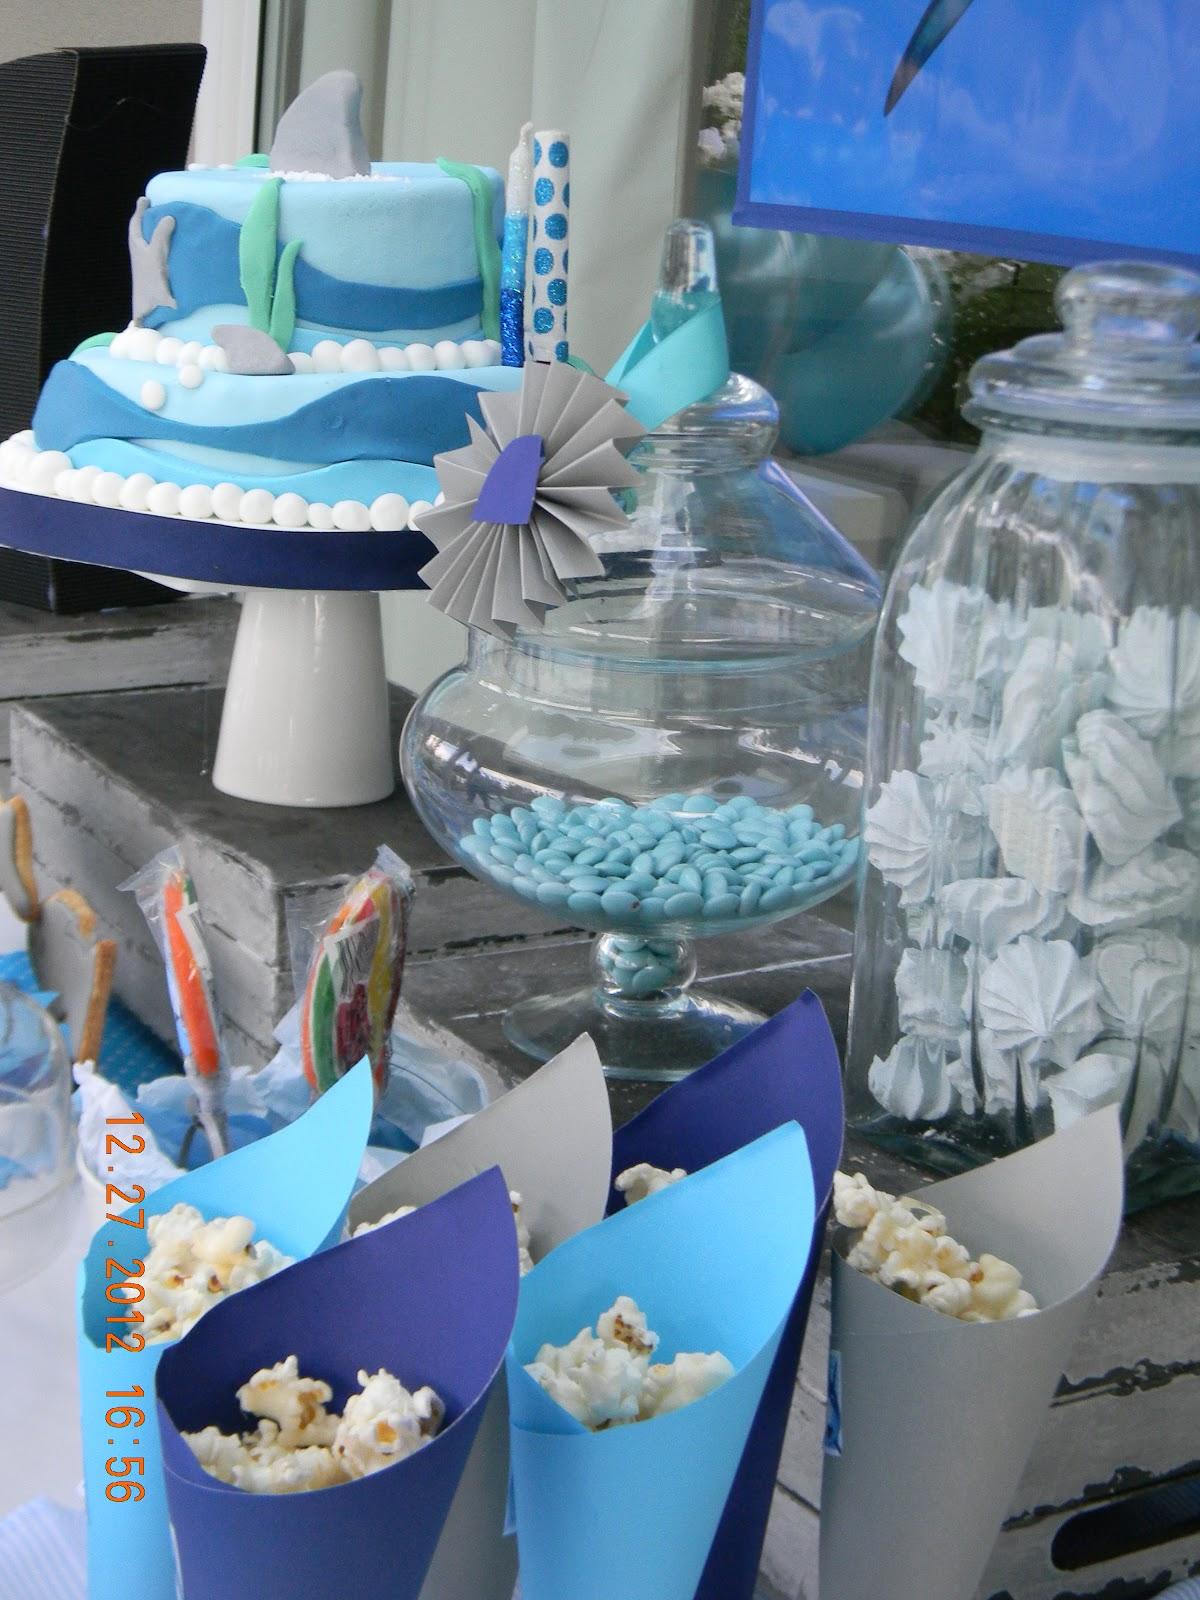 Regalo de cumple birthday gift - 1 part 8